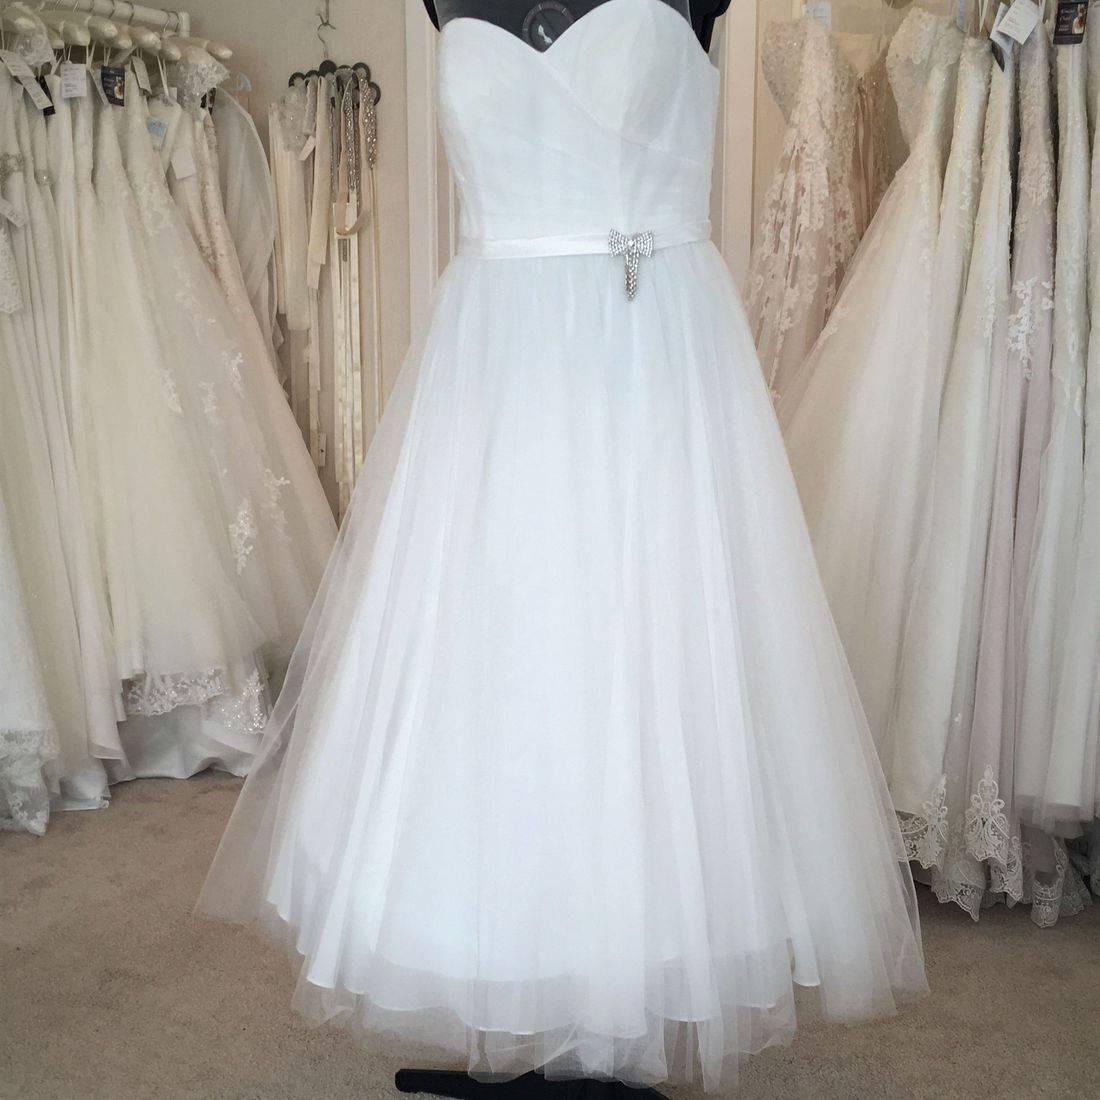 T length wedding dress